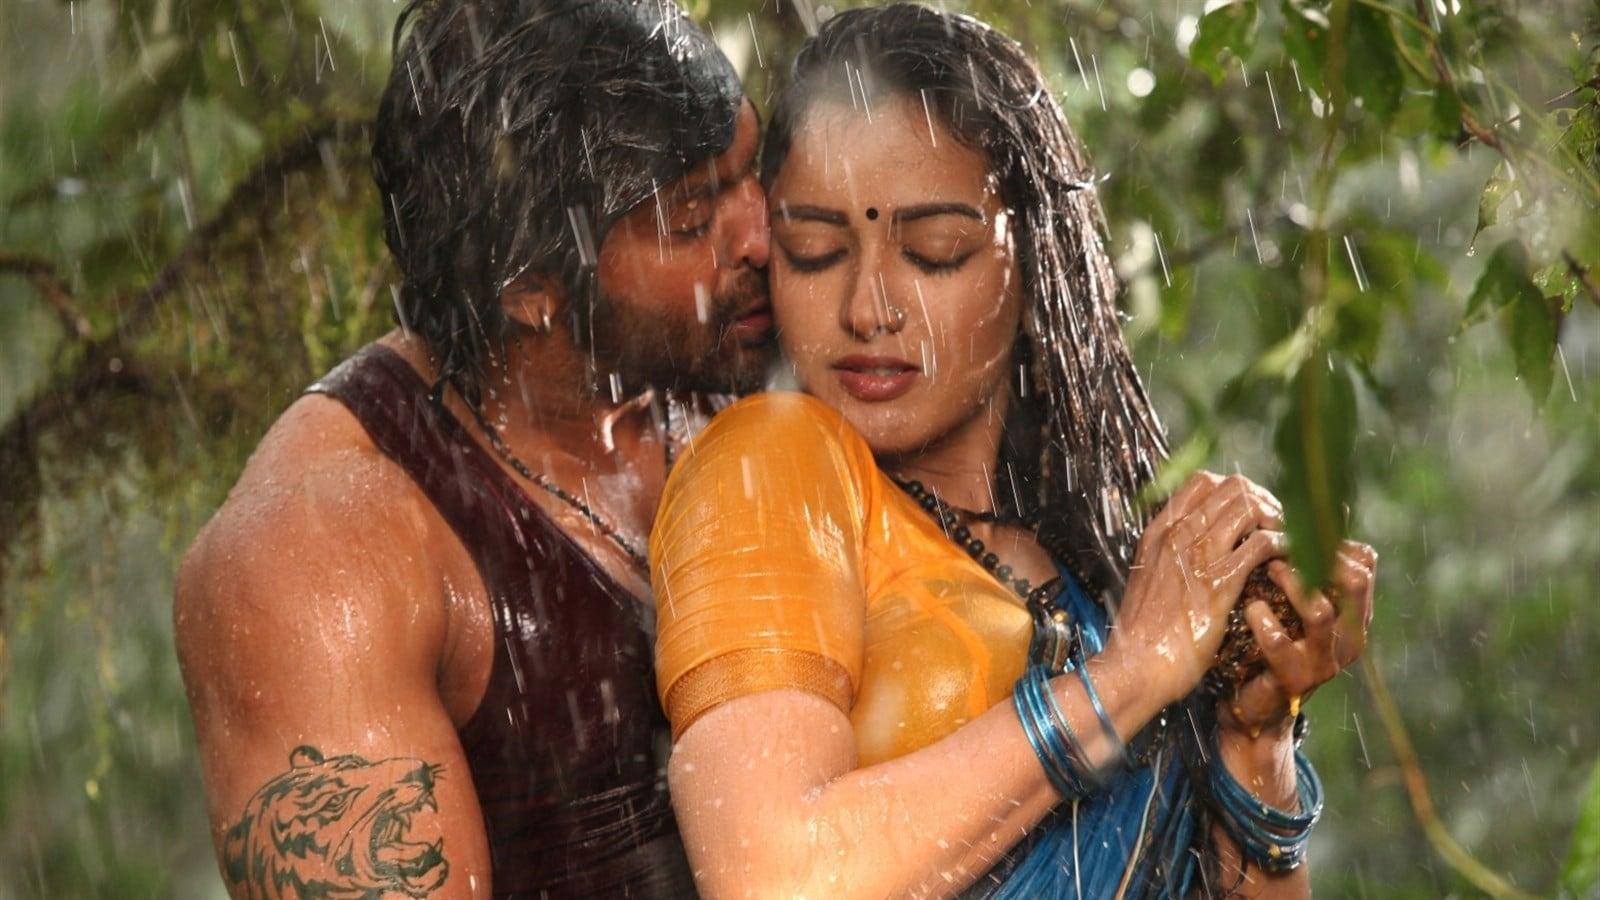 kadamban full movie in hindi dubbed download filmywap.com